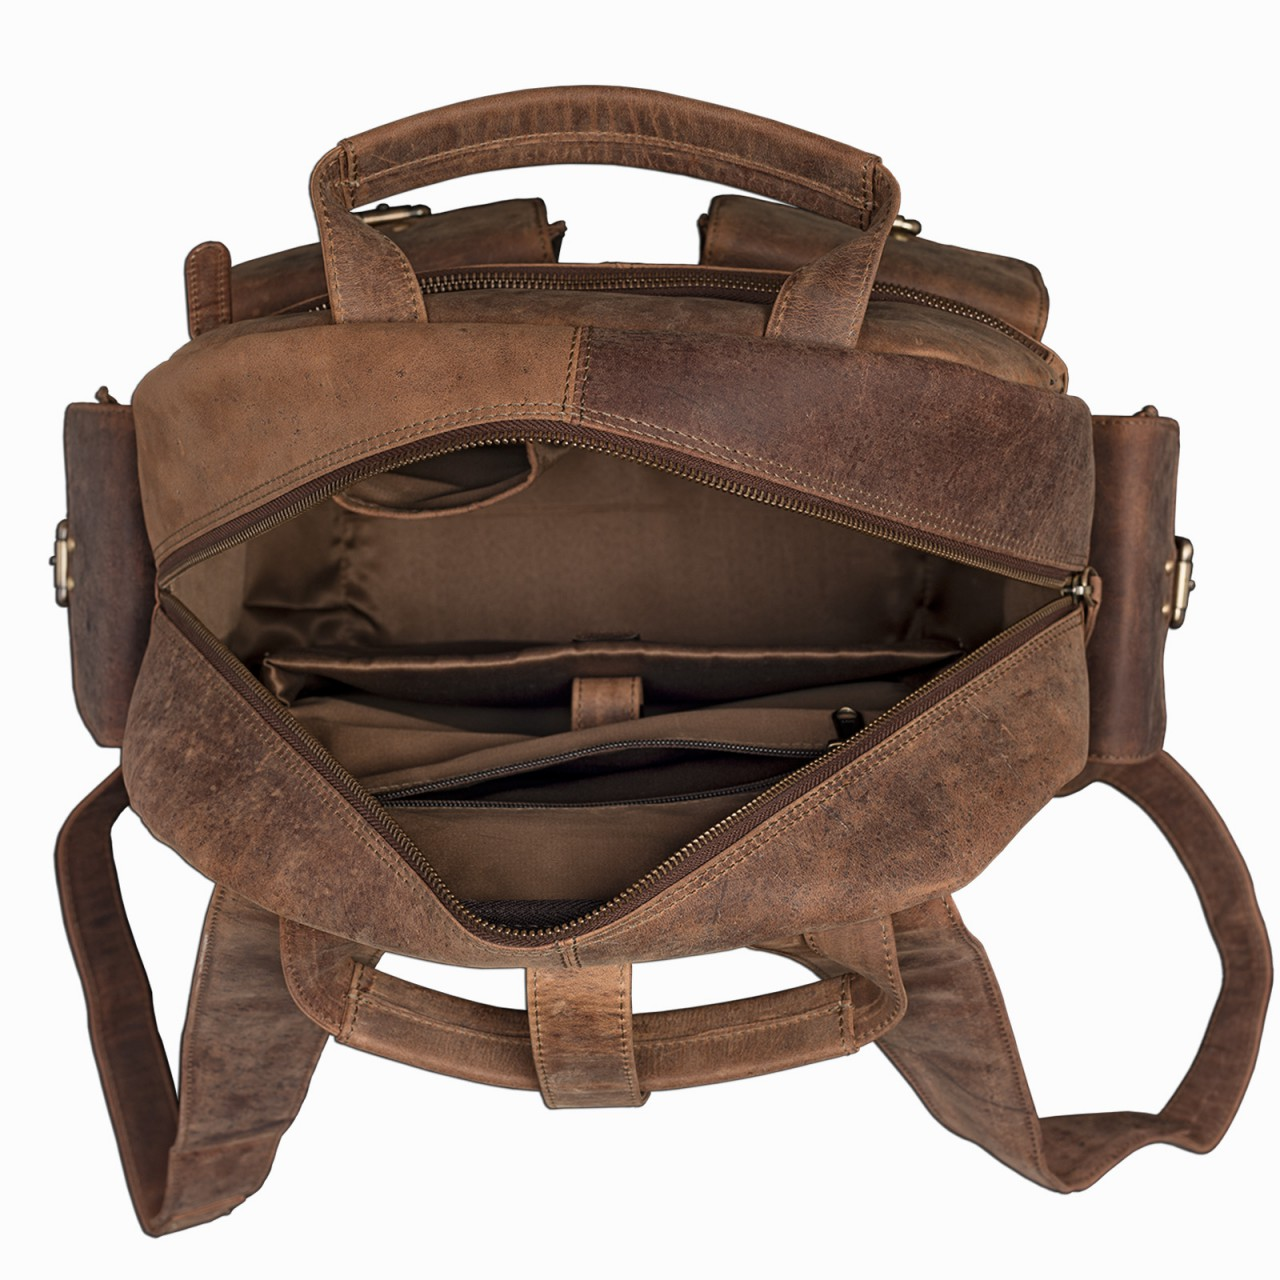 "STILORD ""Nevada"" Rucksack Leder groß im Vintage Design mit 13,3 Zoll Laptopfach Unisex Lederrucksack Uni Schule Lehrer Echtleder  - Bild 5"